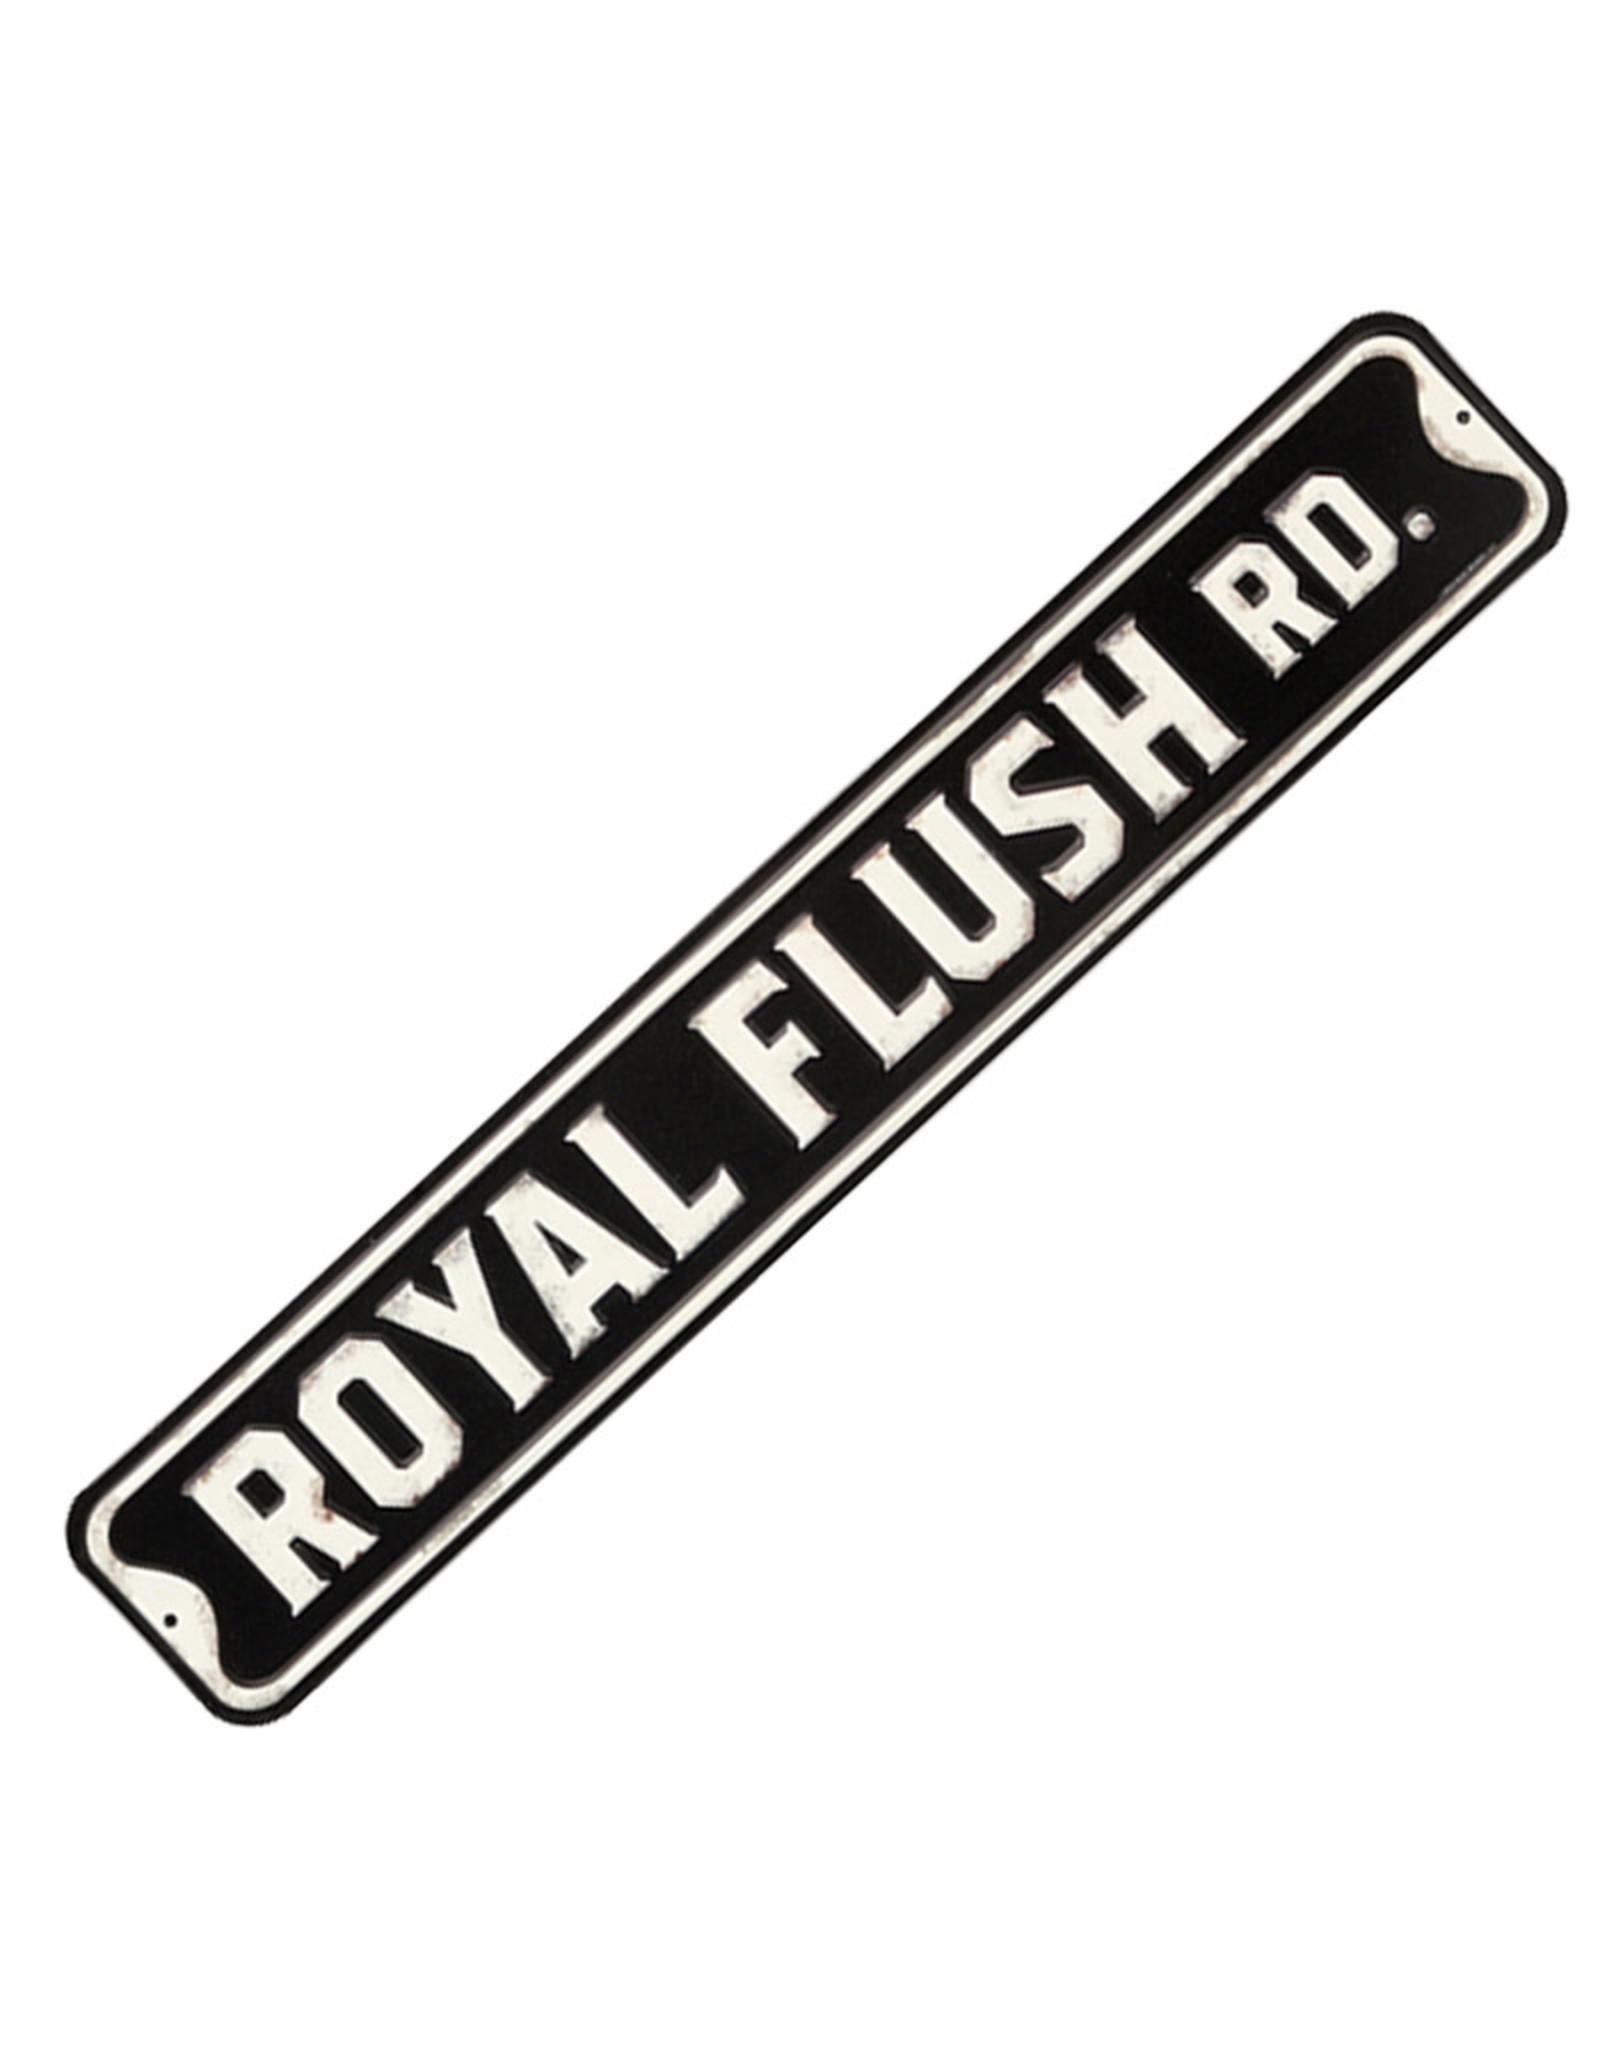 Embossed Metal Plate ( Royal Flush )